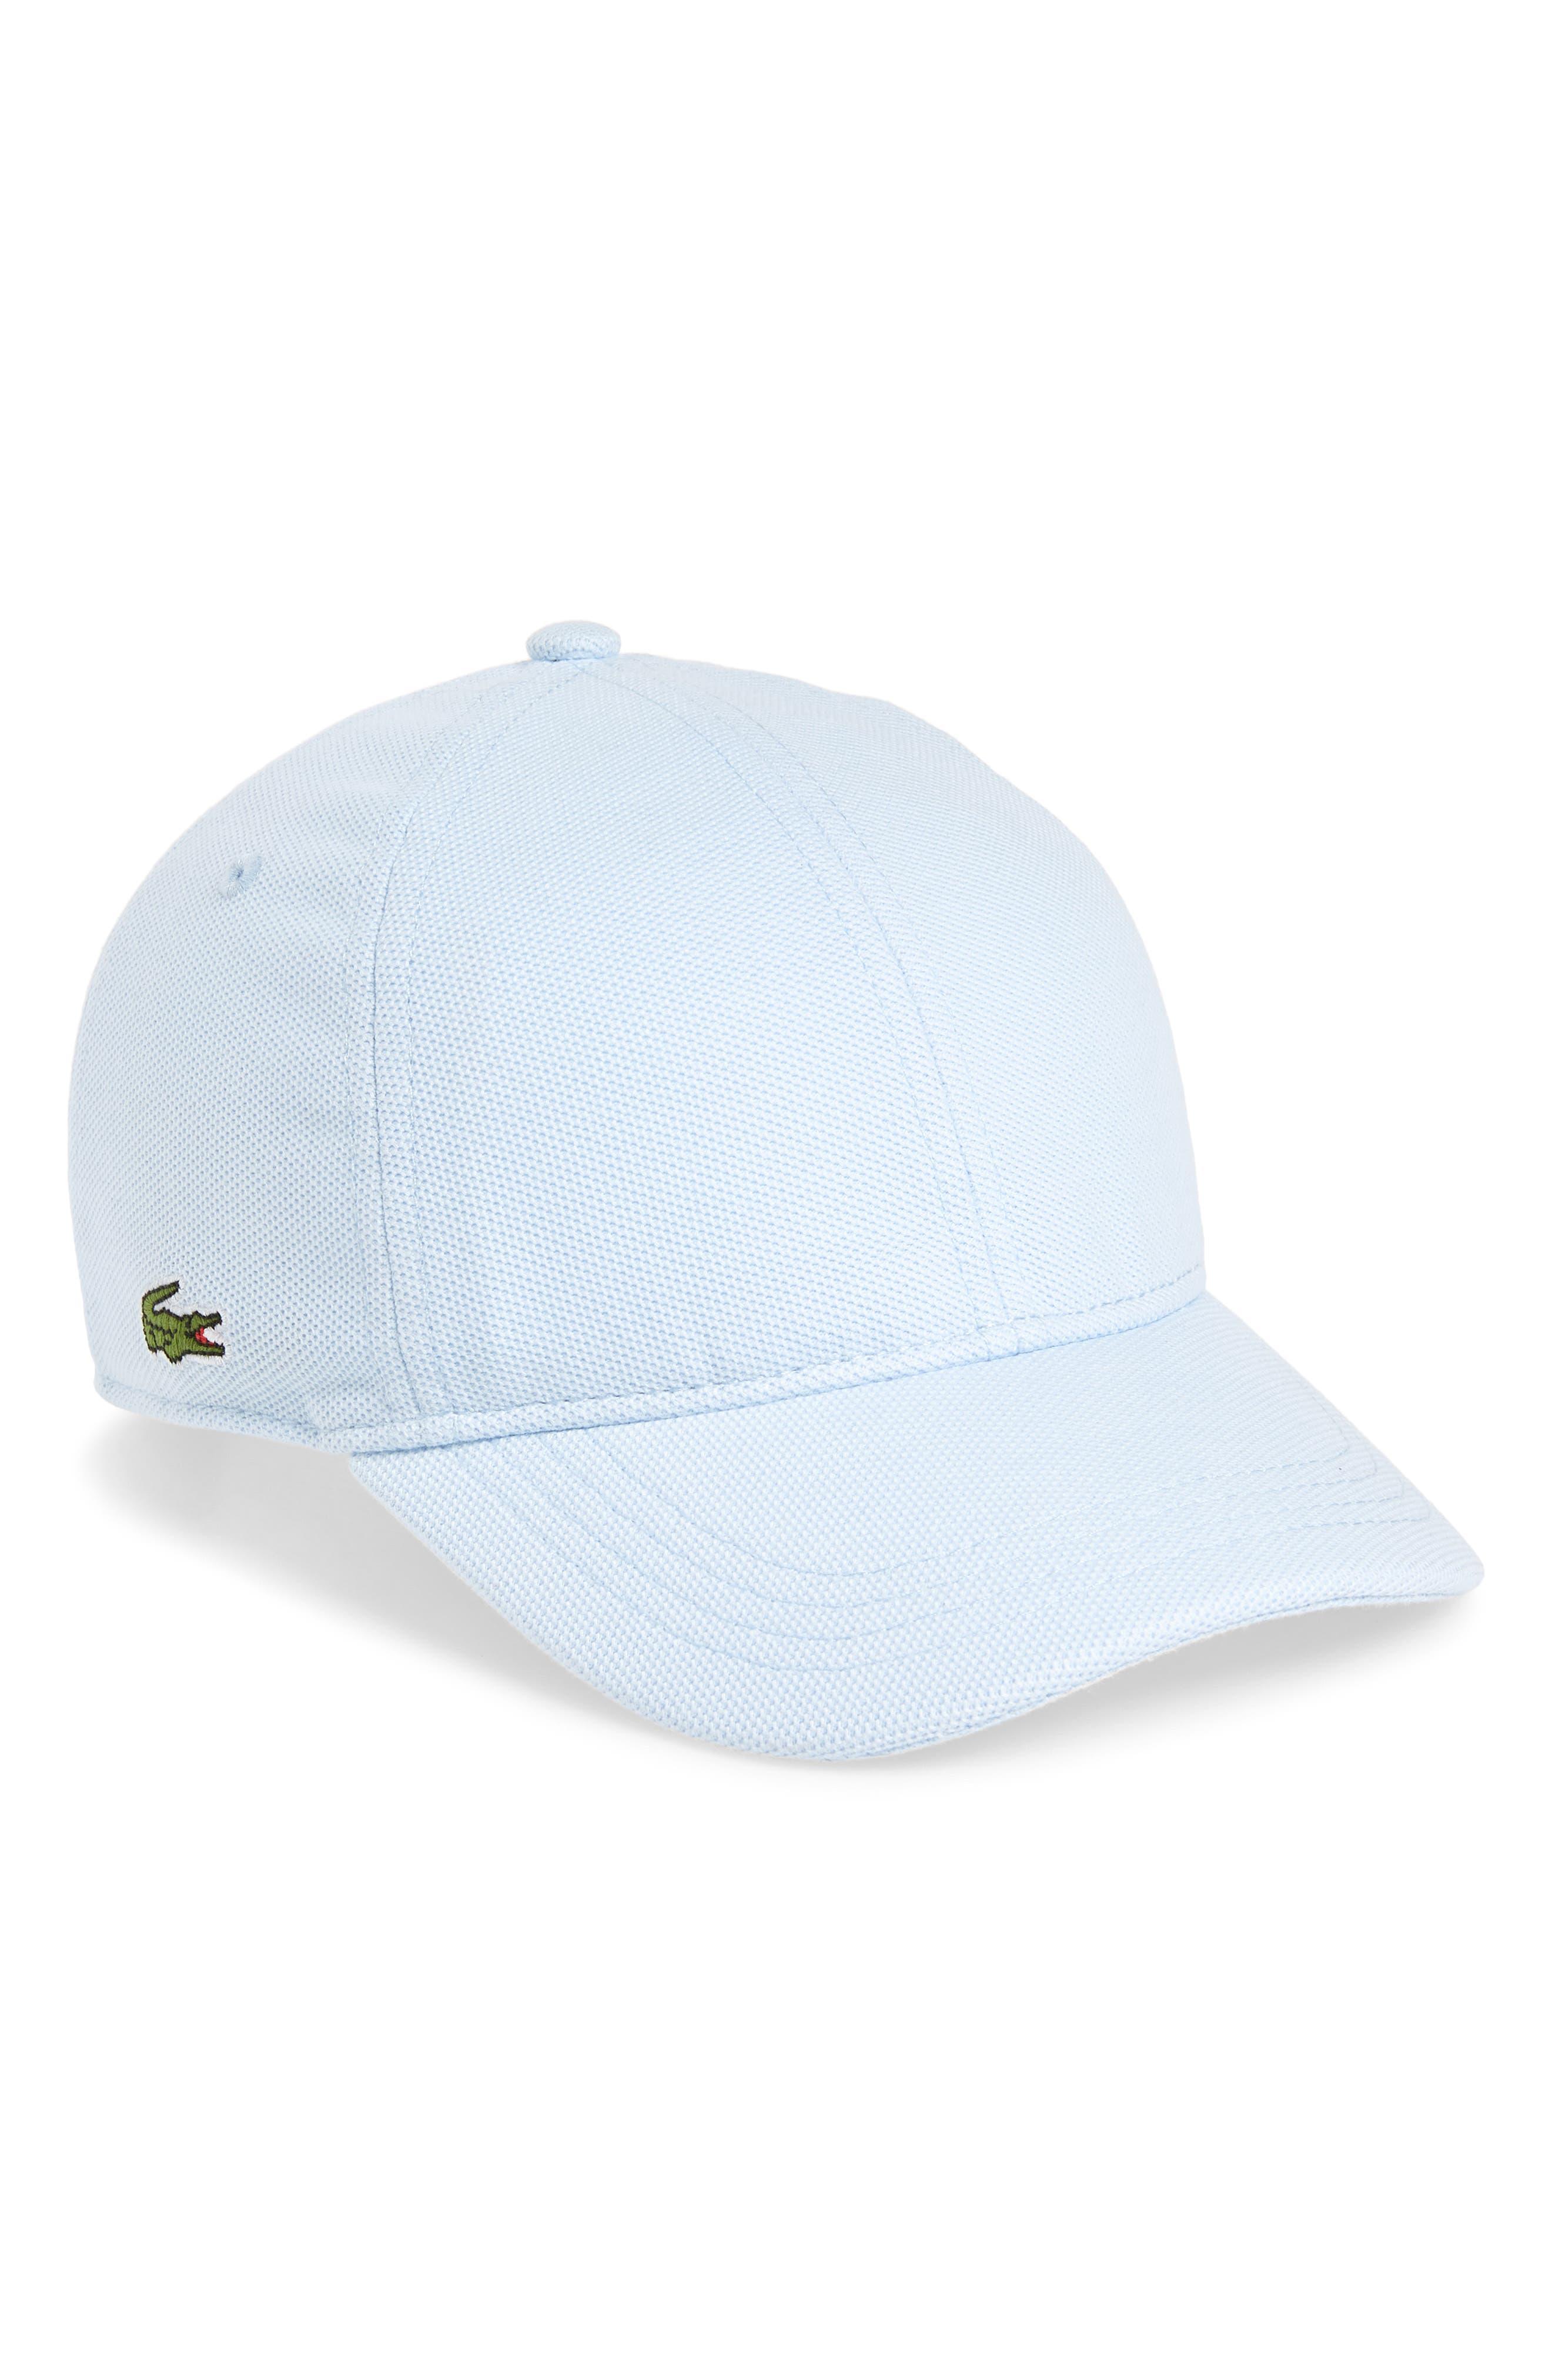 LACOSTE, Croc Cotton Baseball Cap, Main thumbnail 1, color, RILL